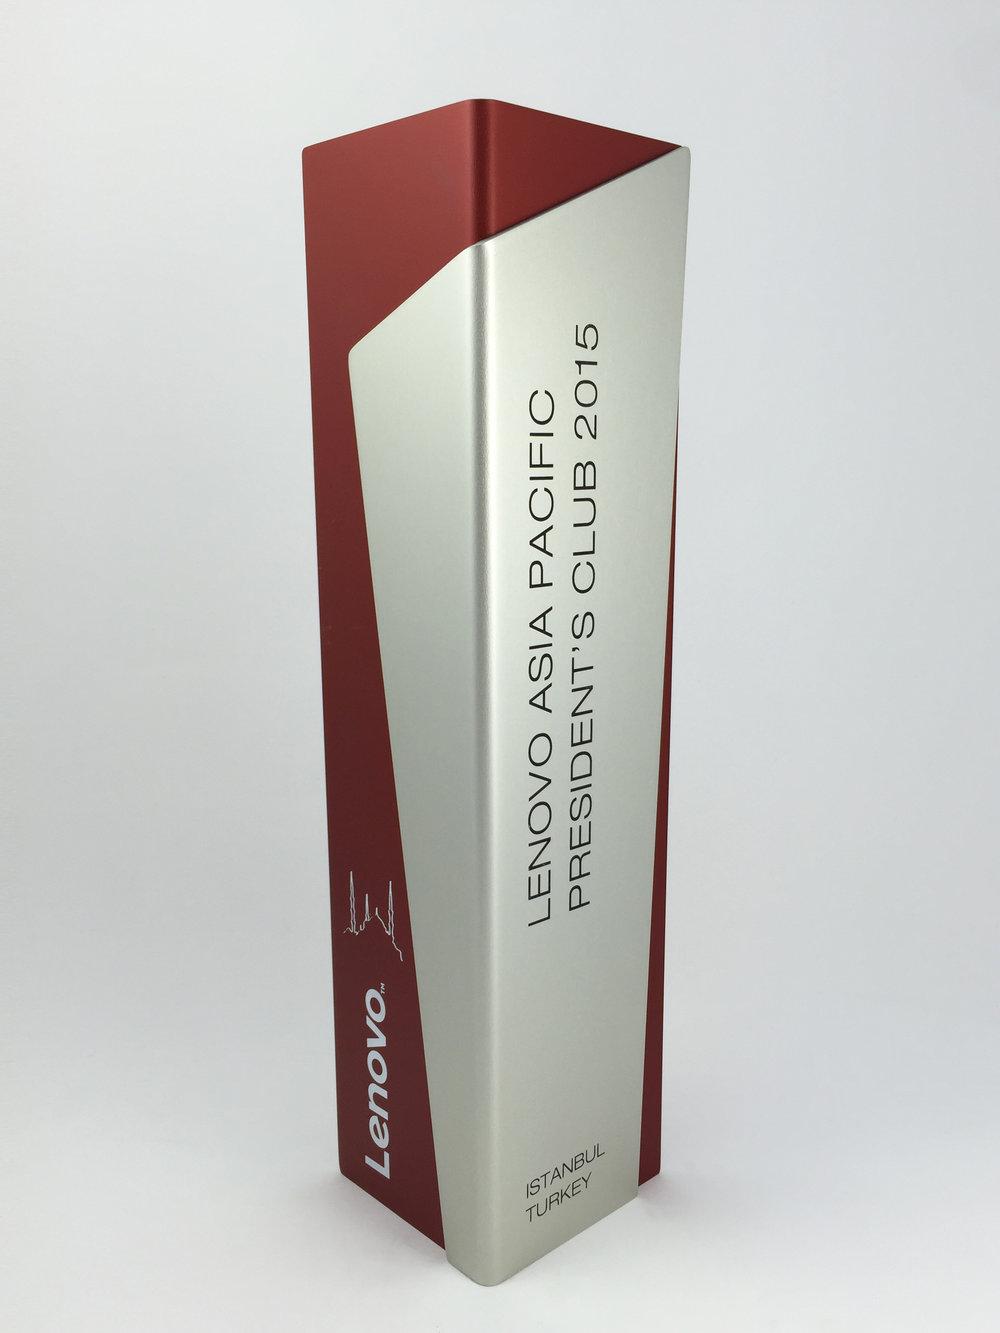 lenovo-presidents-club-aluminium-trophy-awards-02.jpg